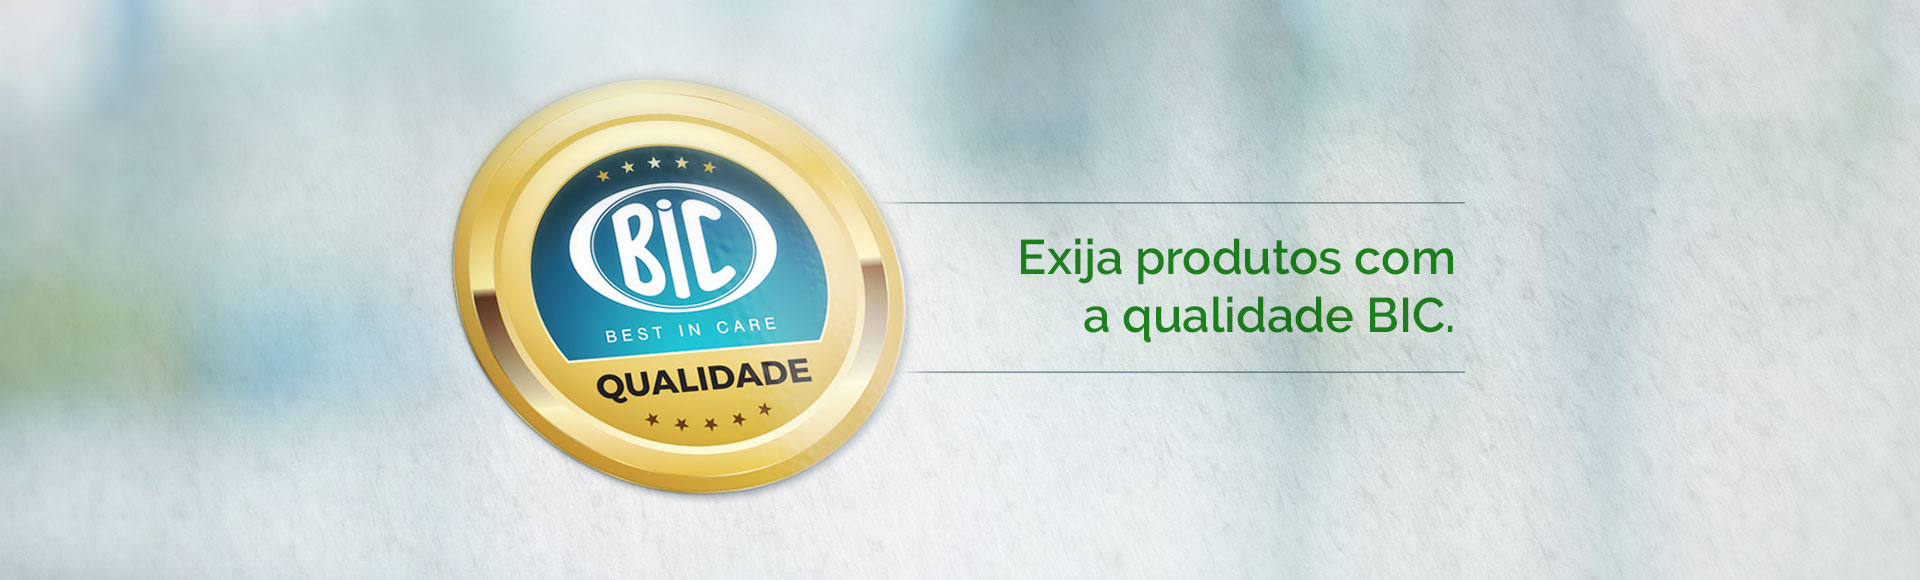 slide-06-qualidade-bic